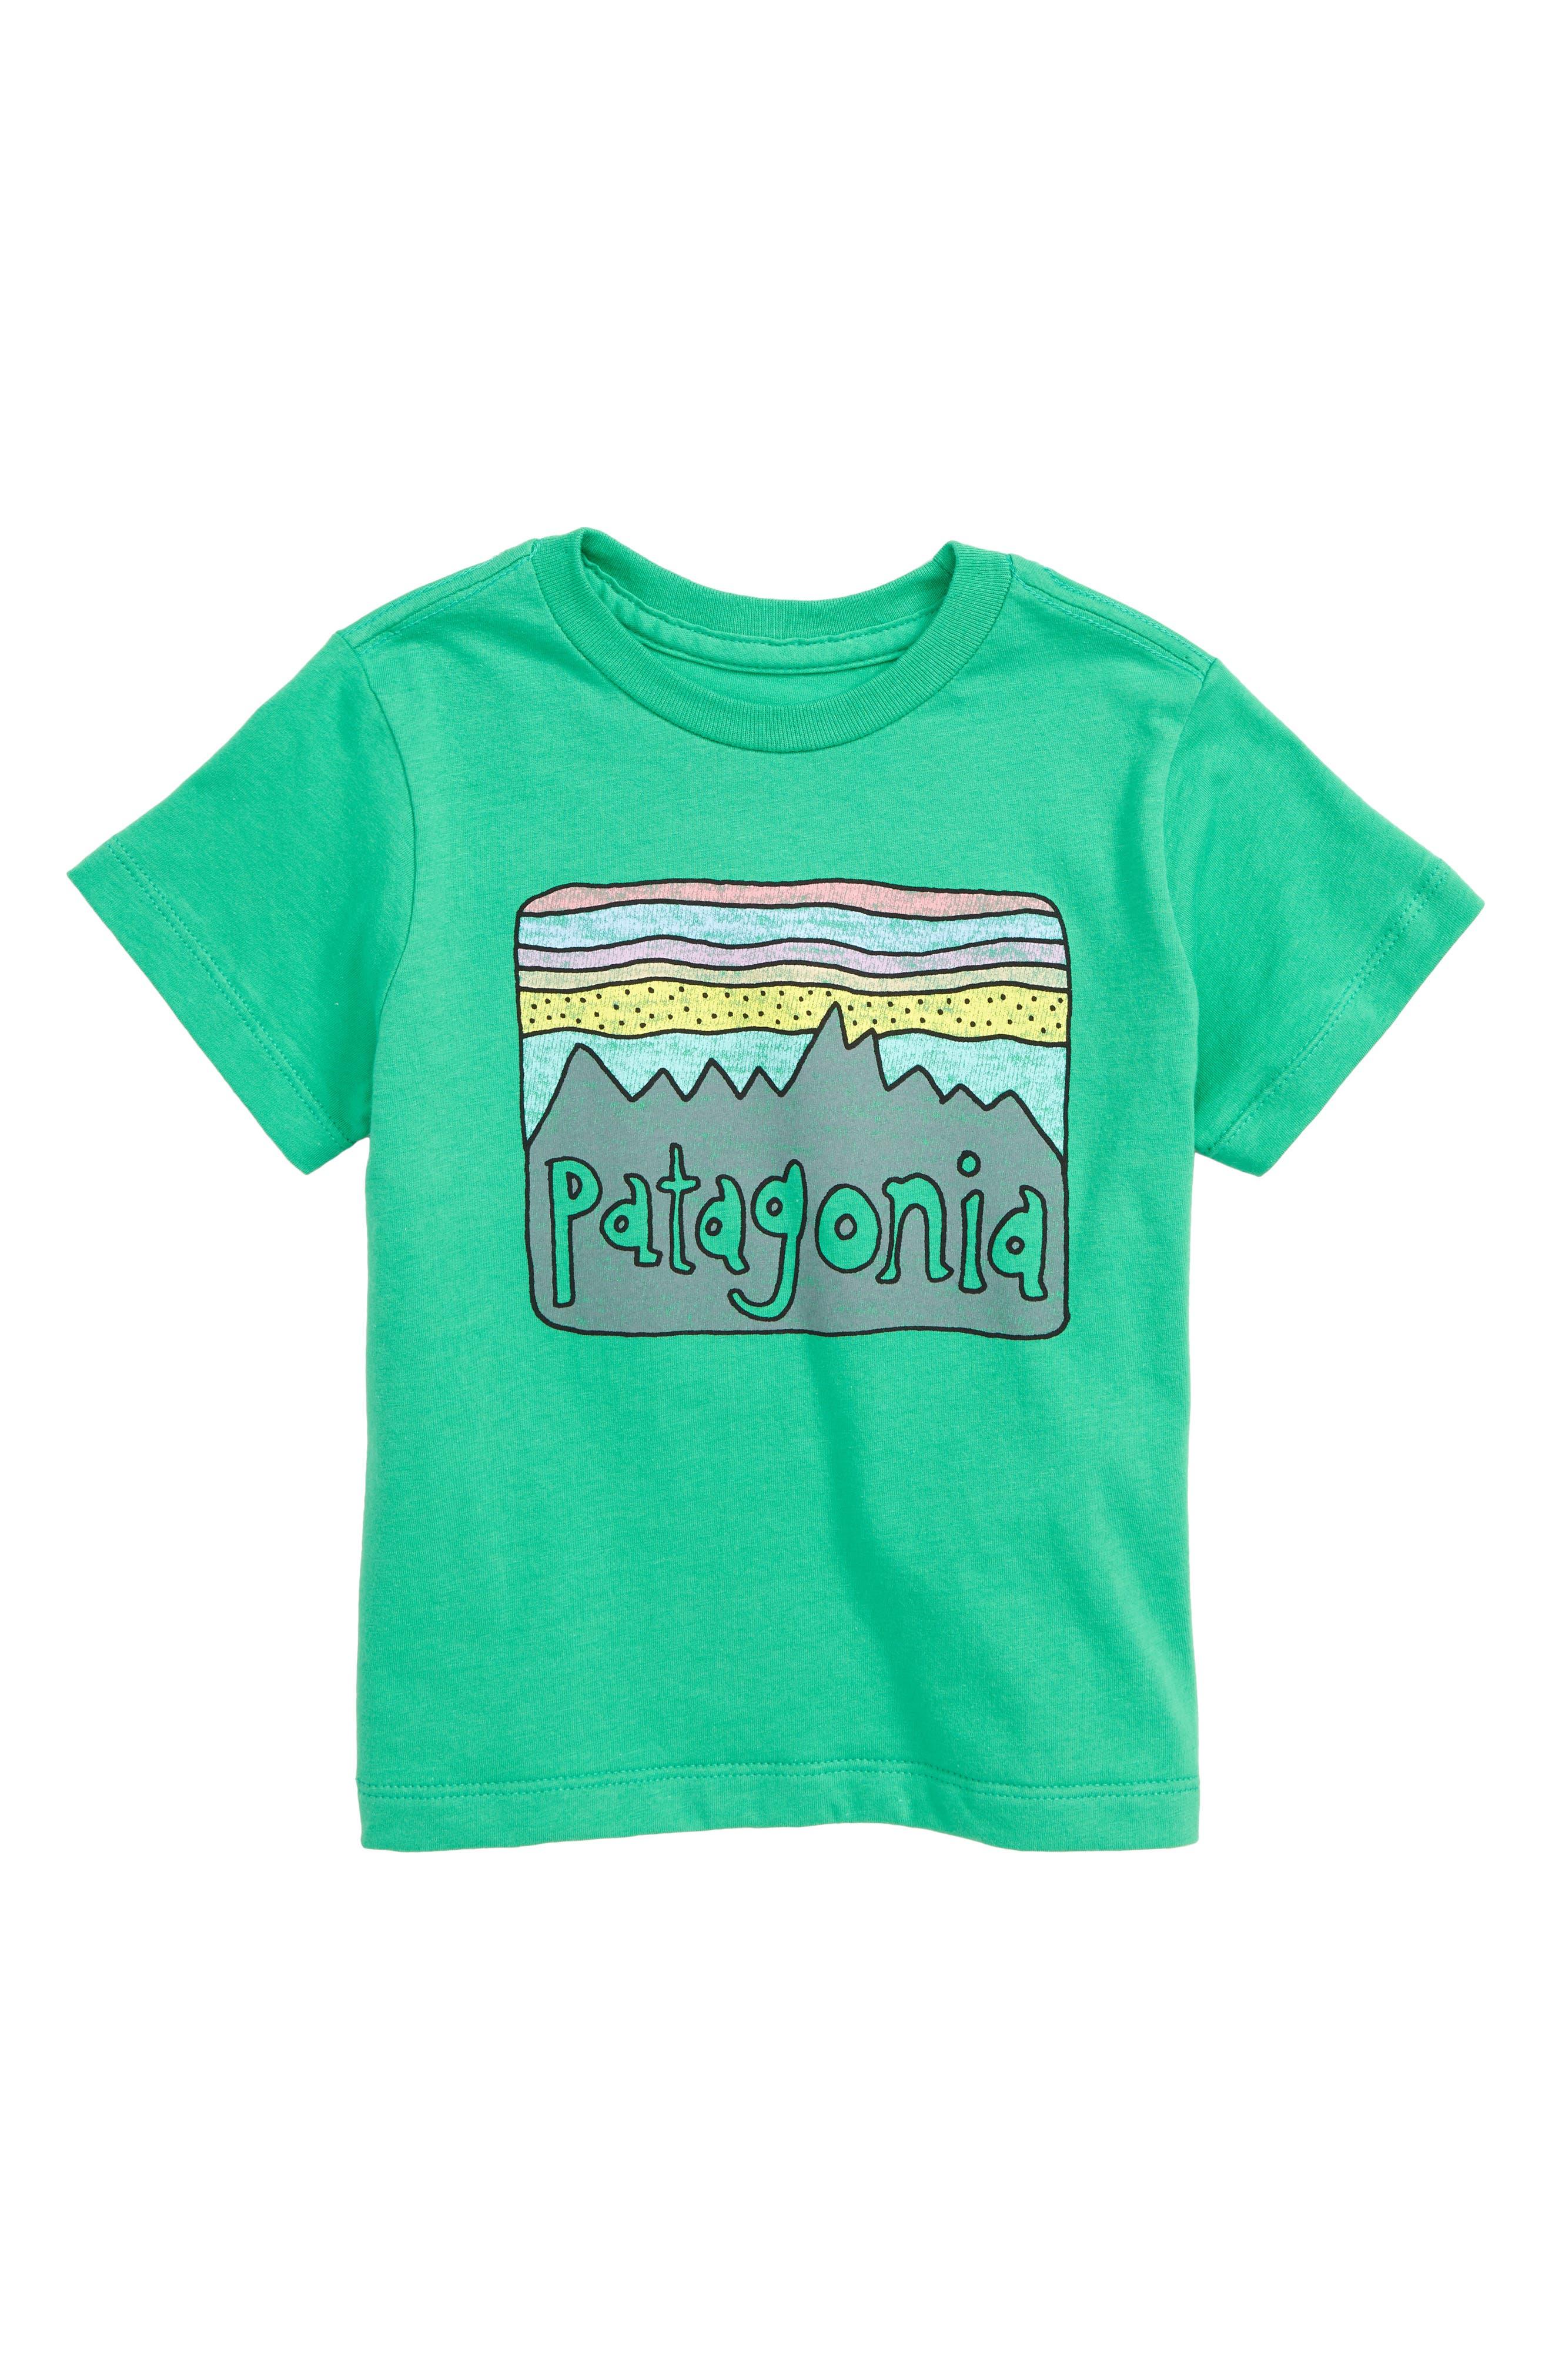 PATAGONIA Fitz Roy Skies Graphic Organic Cotton T-Shirt, Main, color, 300